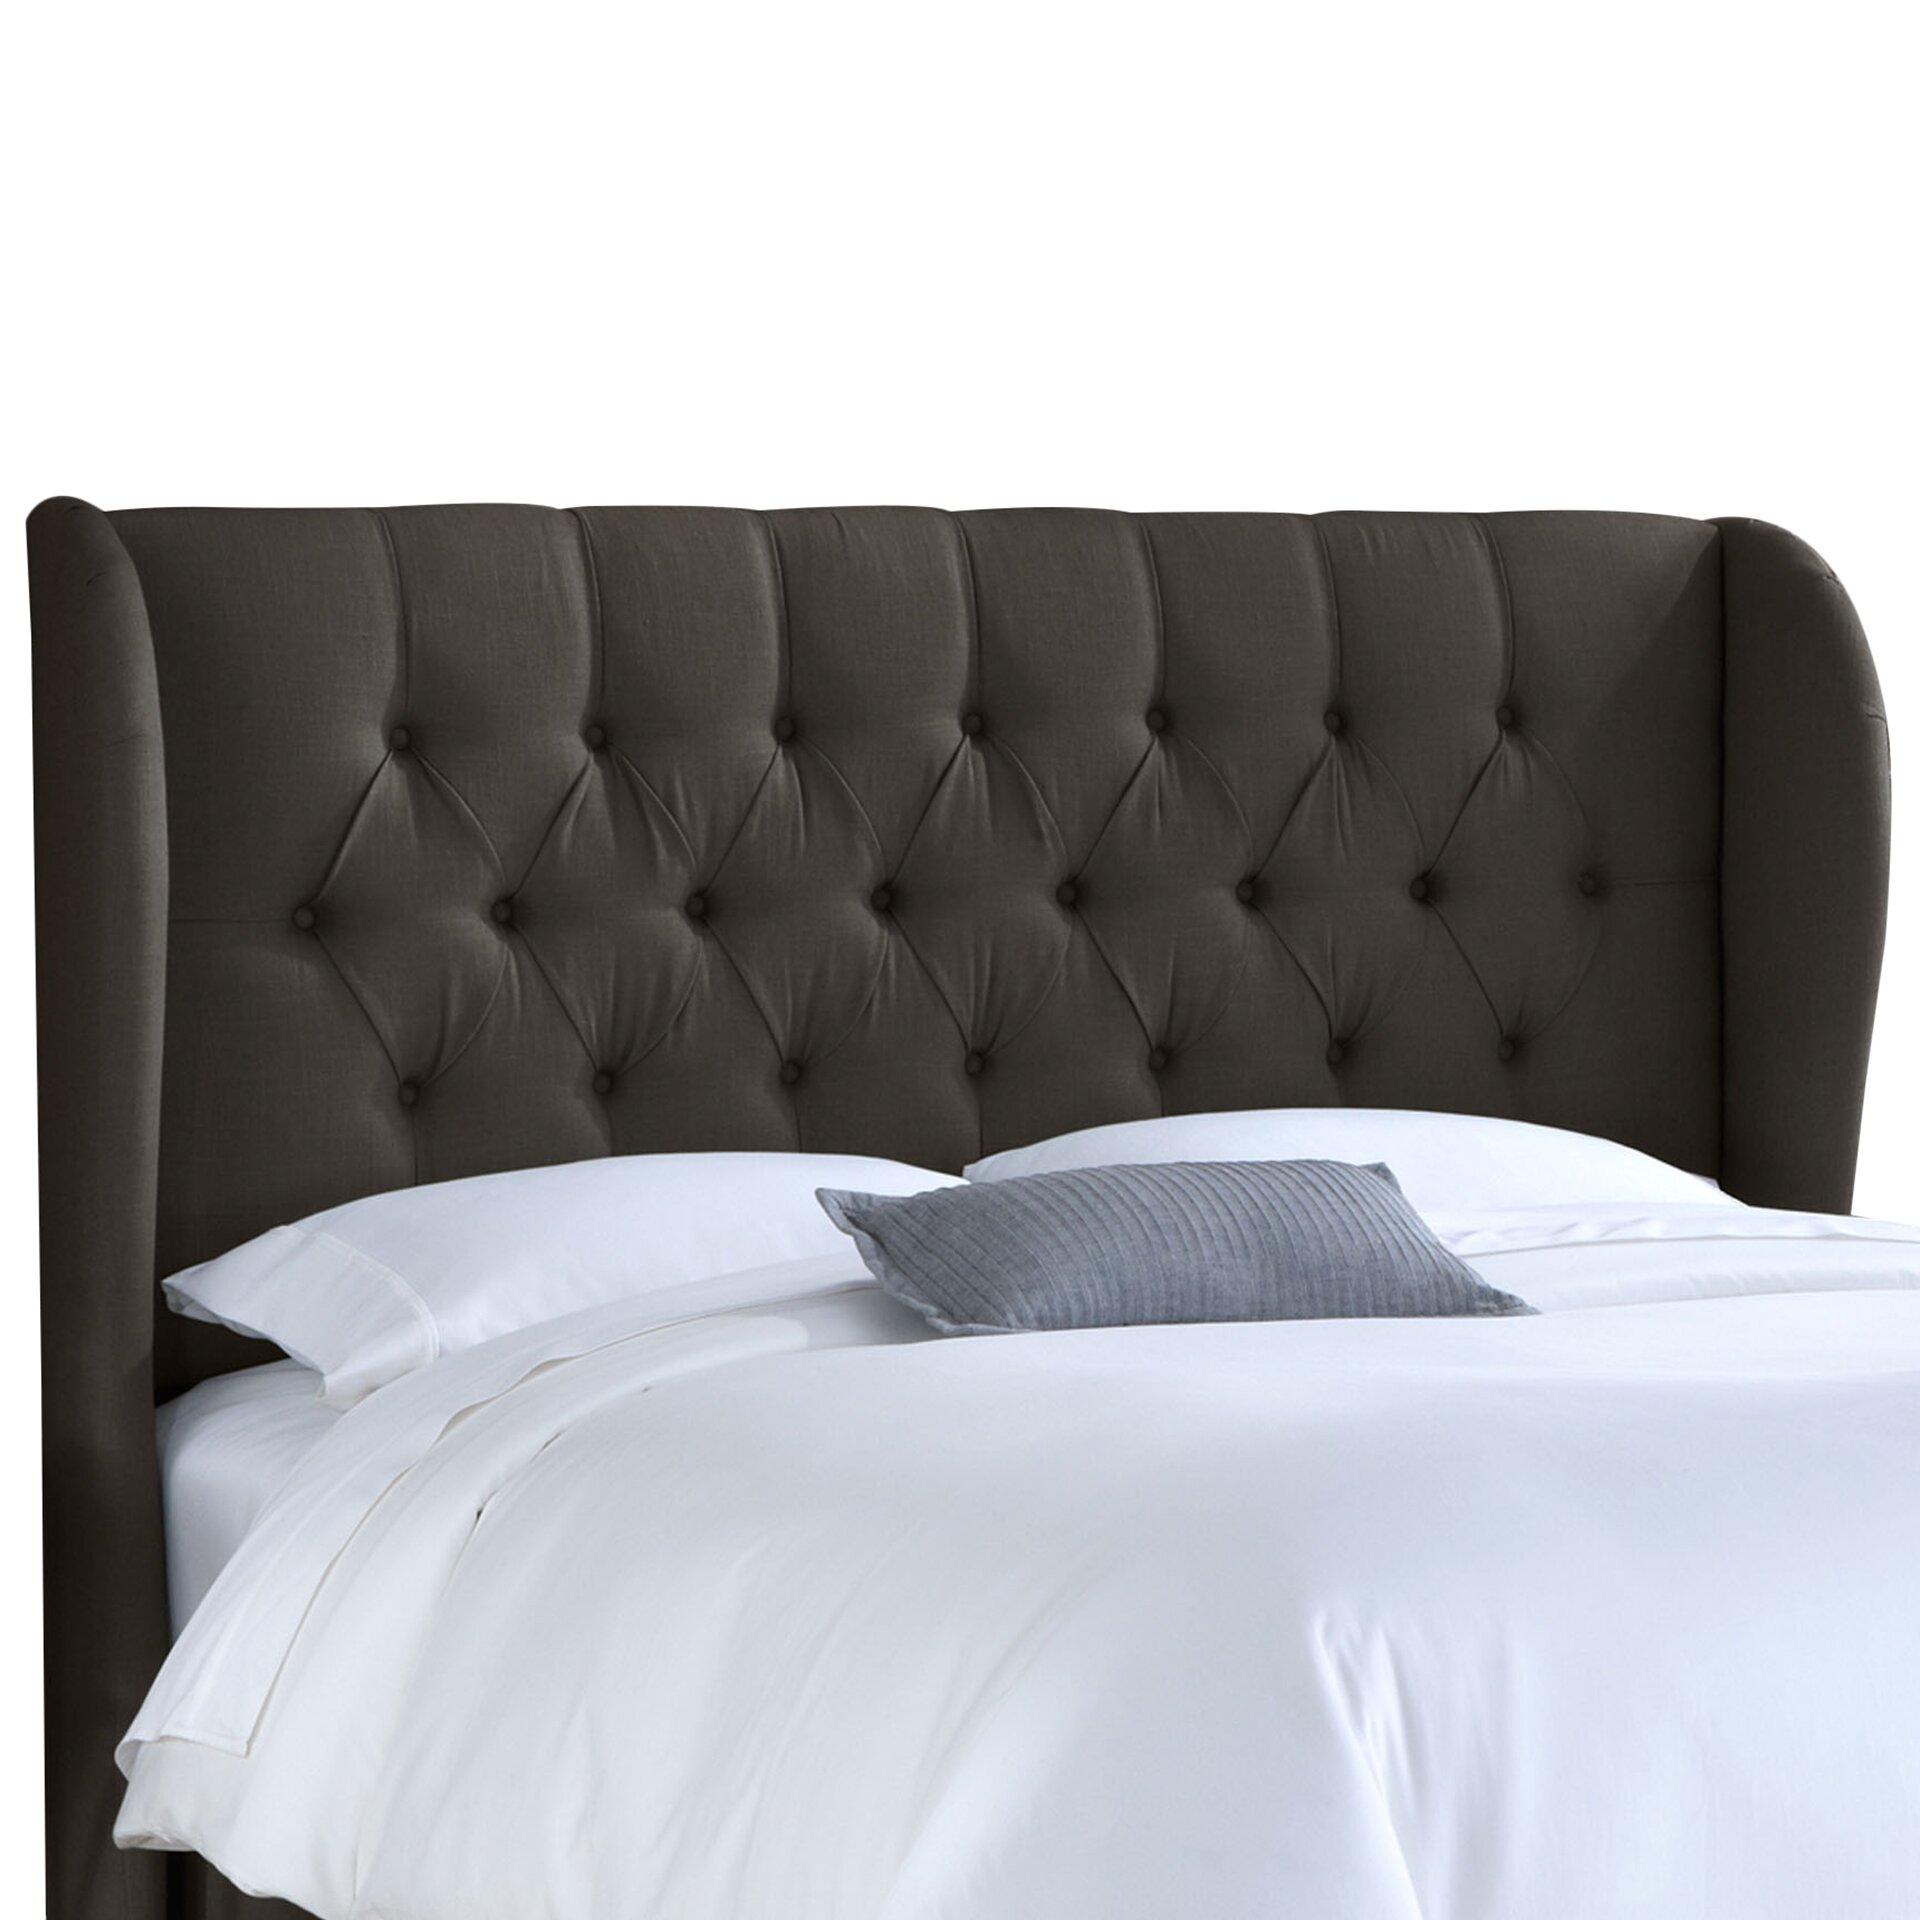 house of hampton stowmarket tufted linen diamond. Black Bedroom Furniture Sets. Home Design Ideas